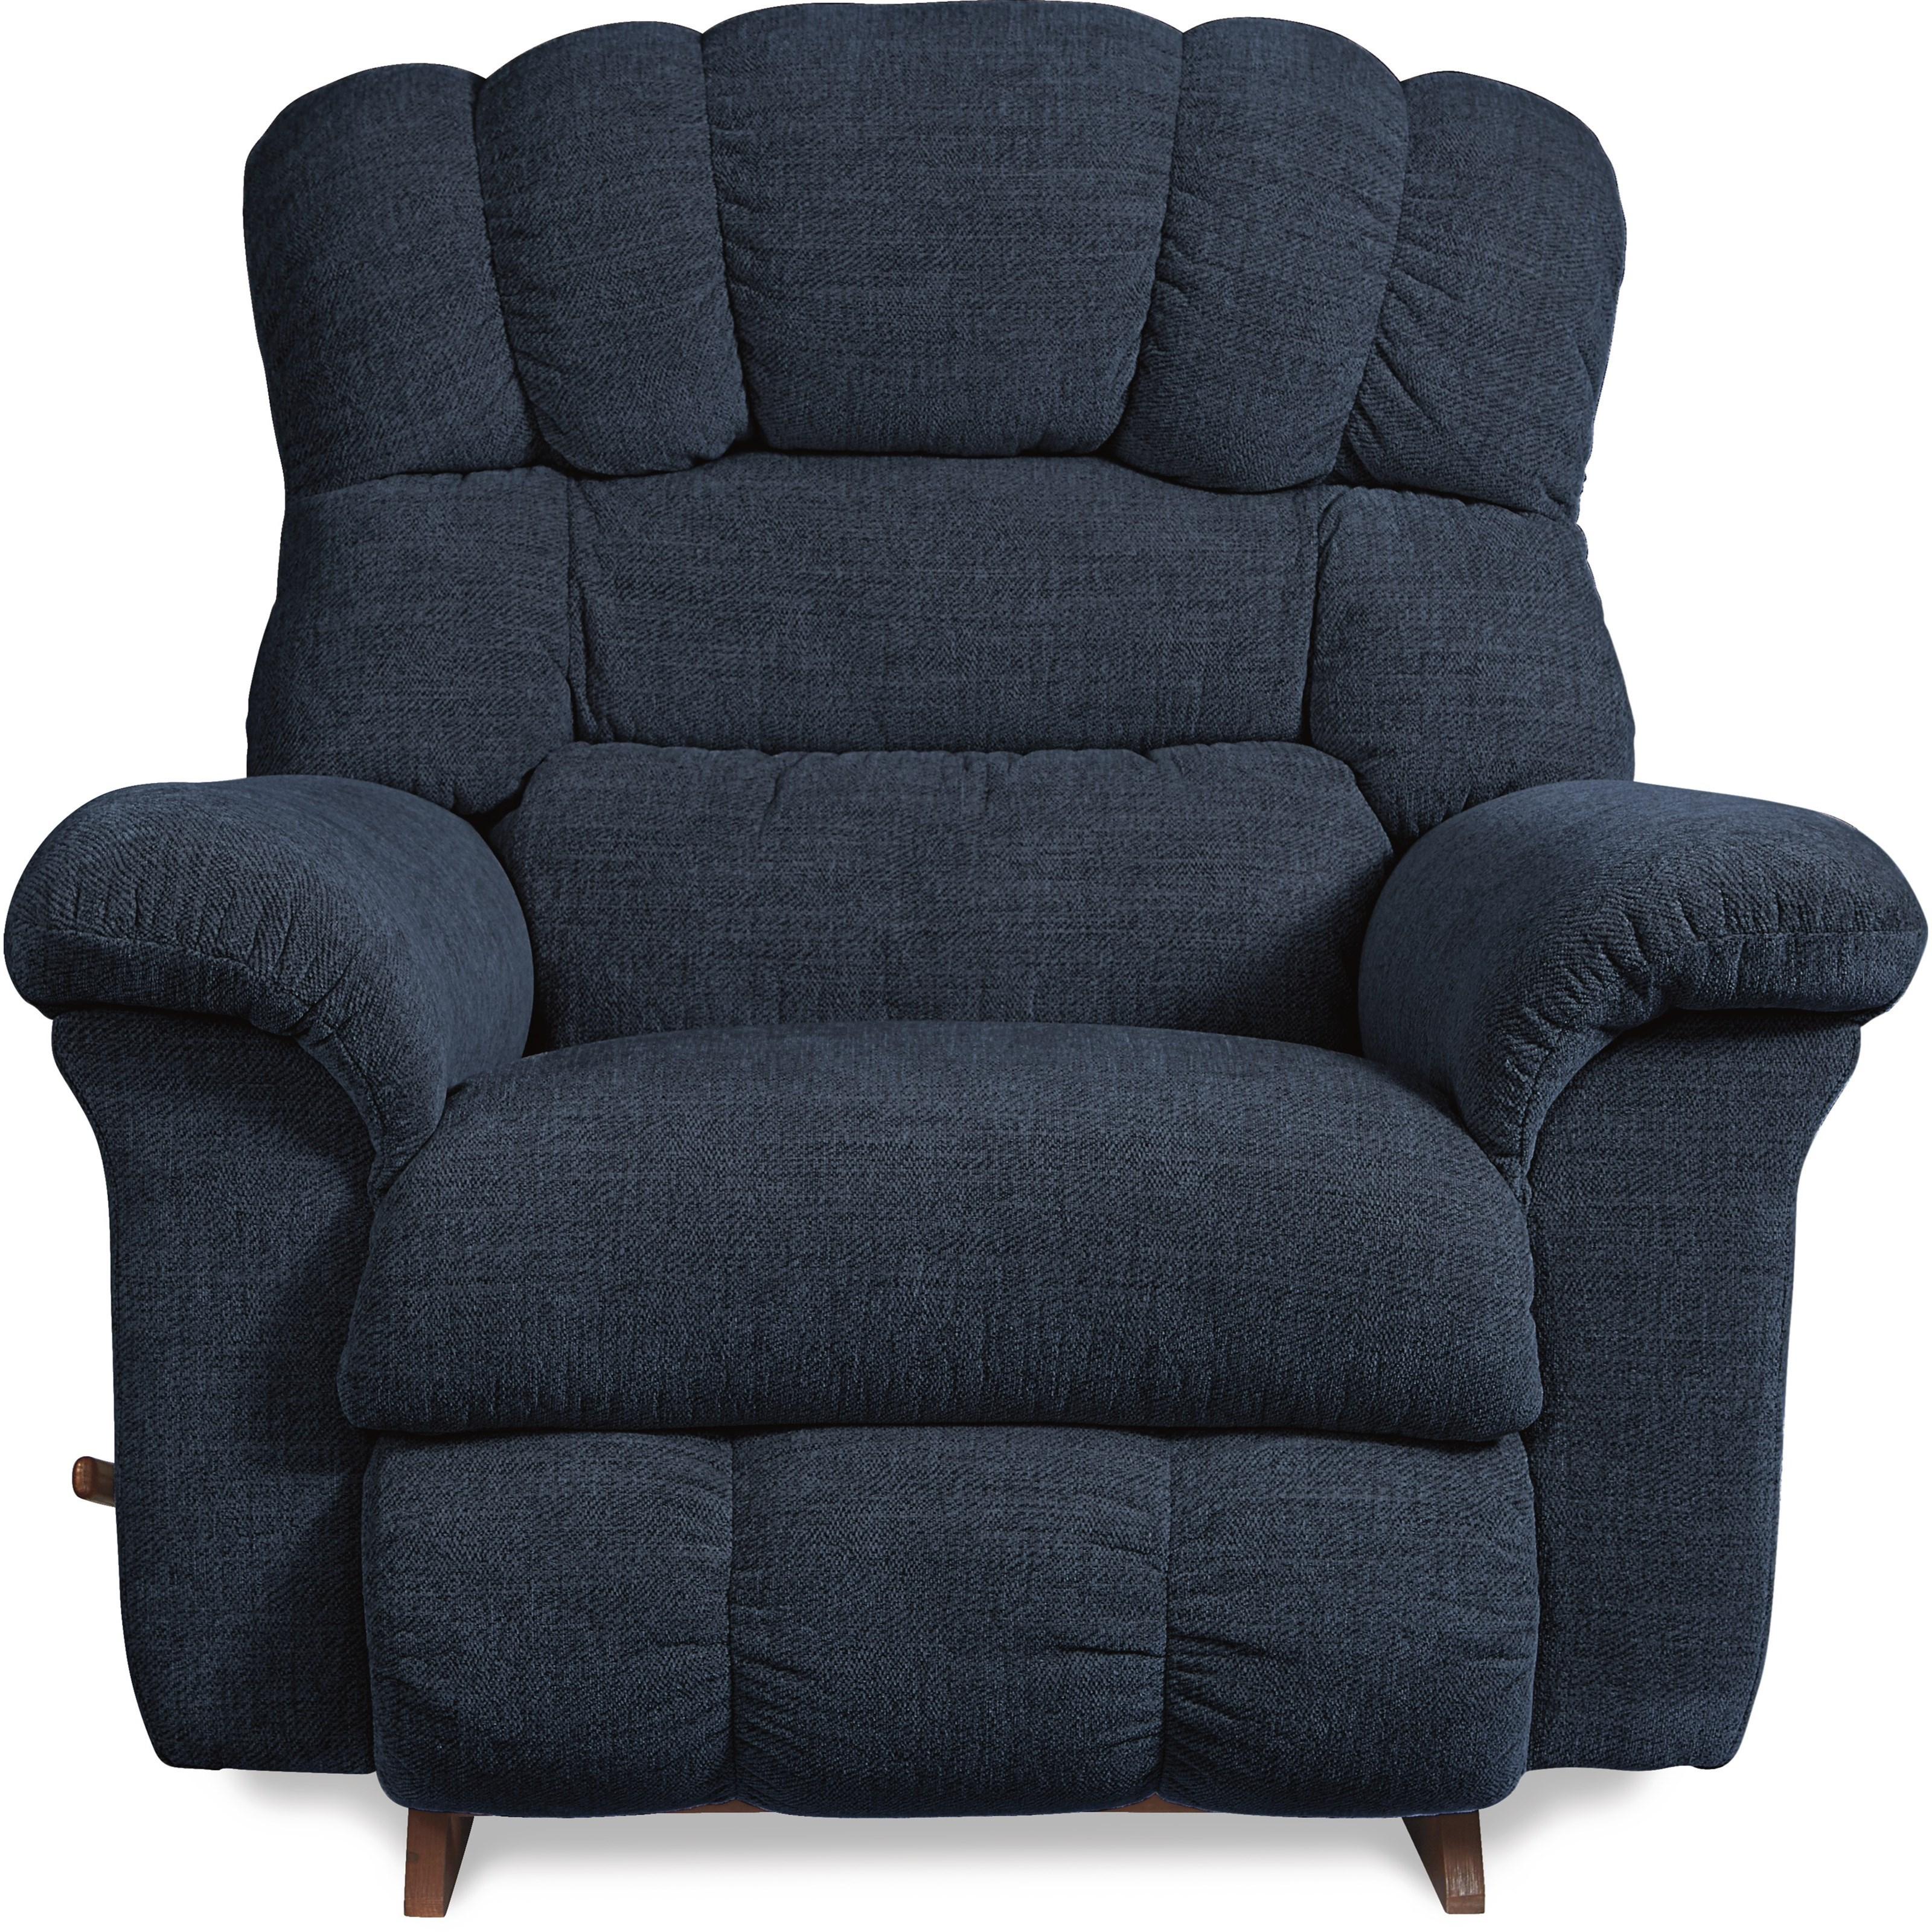 Bon La Z Boy Crandell Reclina Rocker Reclining Chair